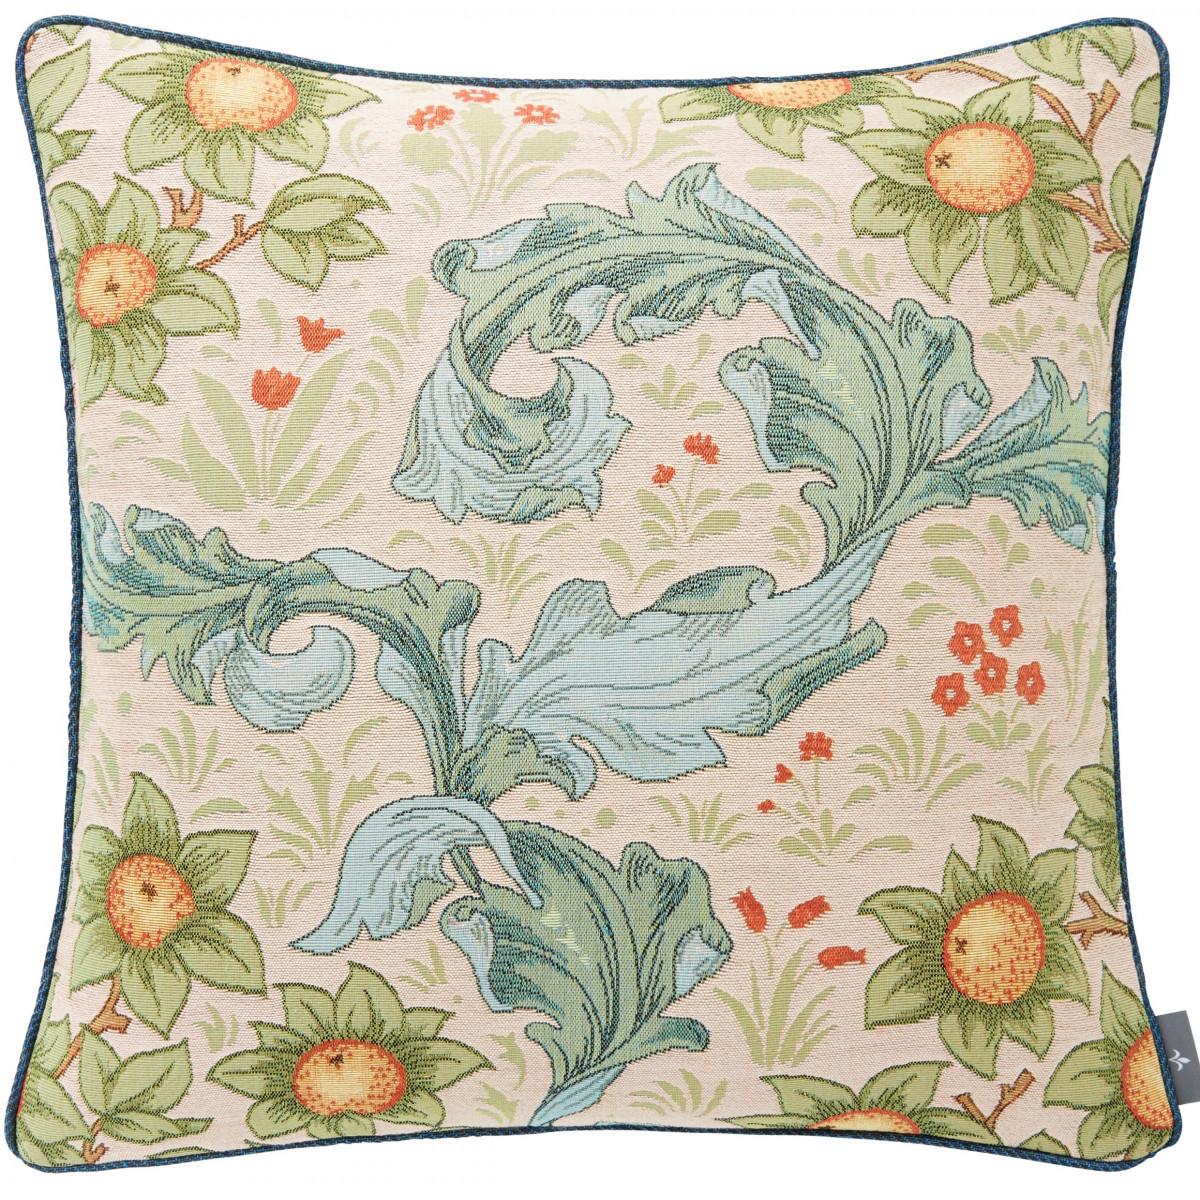 Coussin tapisserie oranger Beige 50 x 50